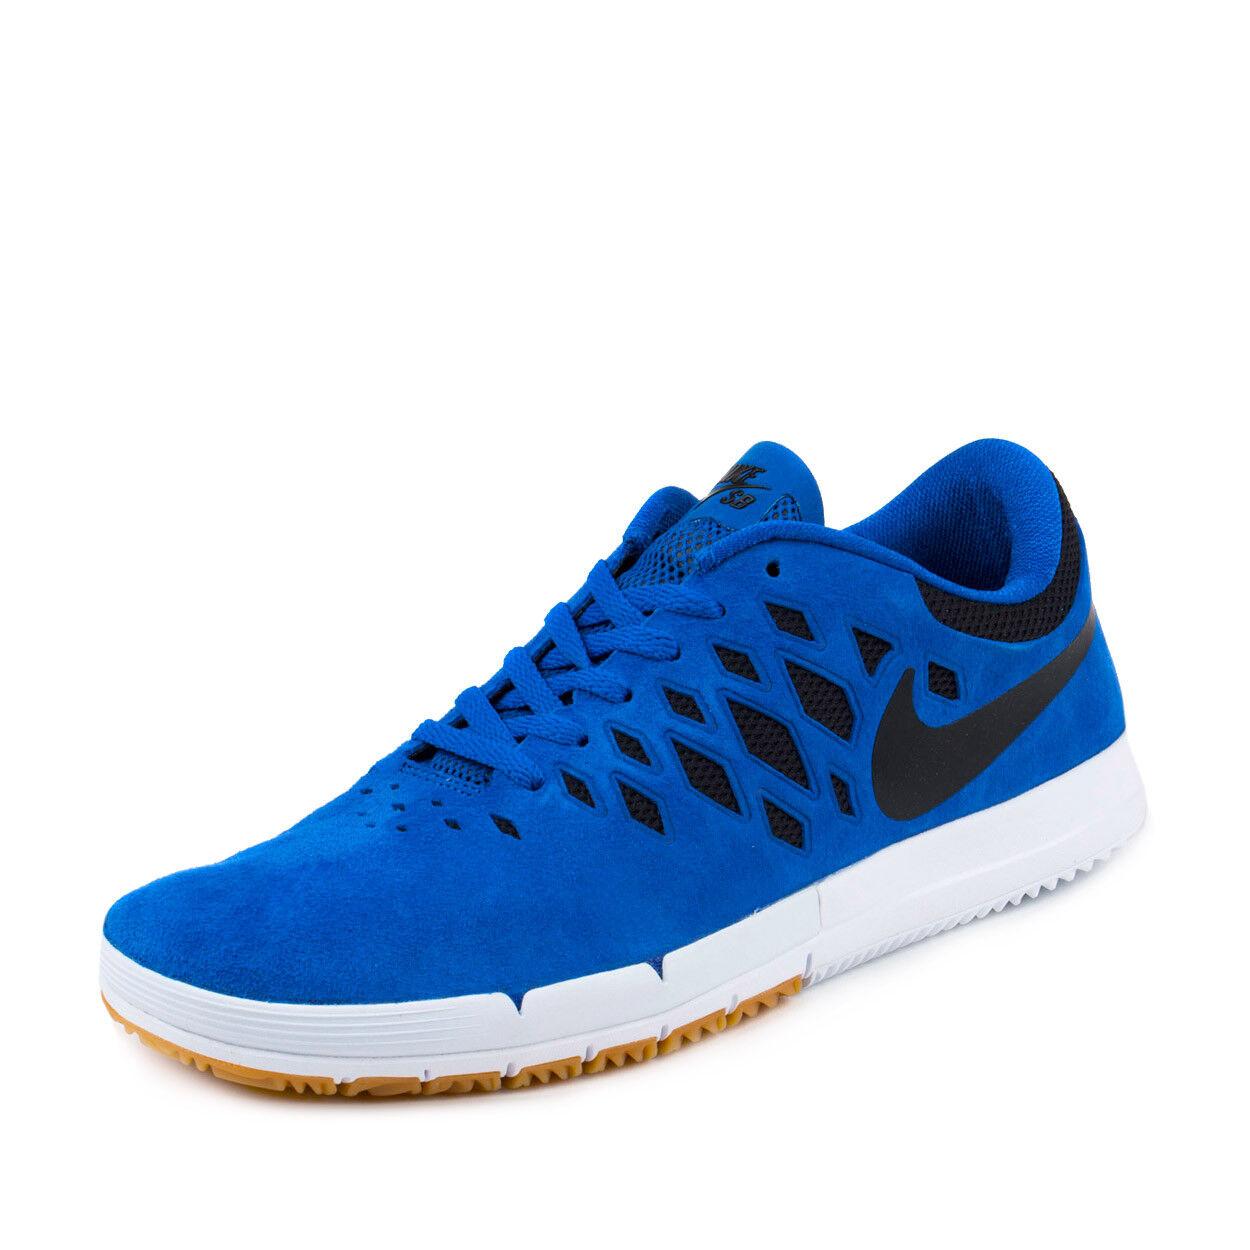 Nike Mens Free SB Game Royal/Black-White 704936-401